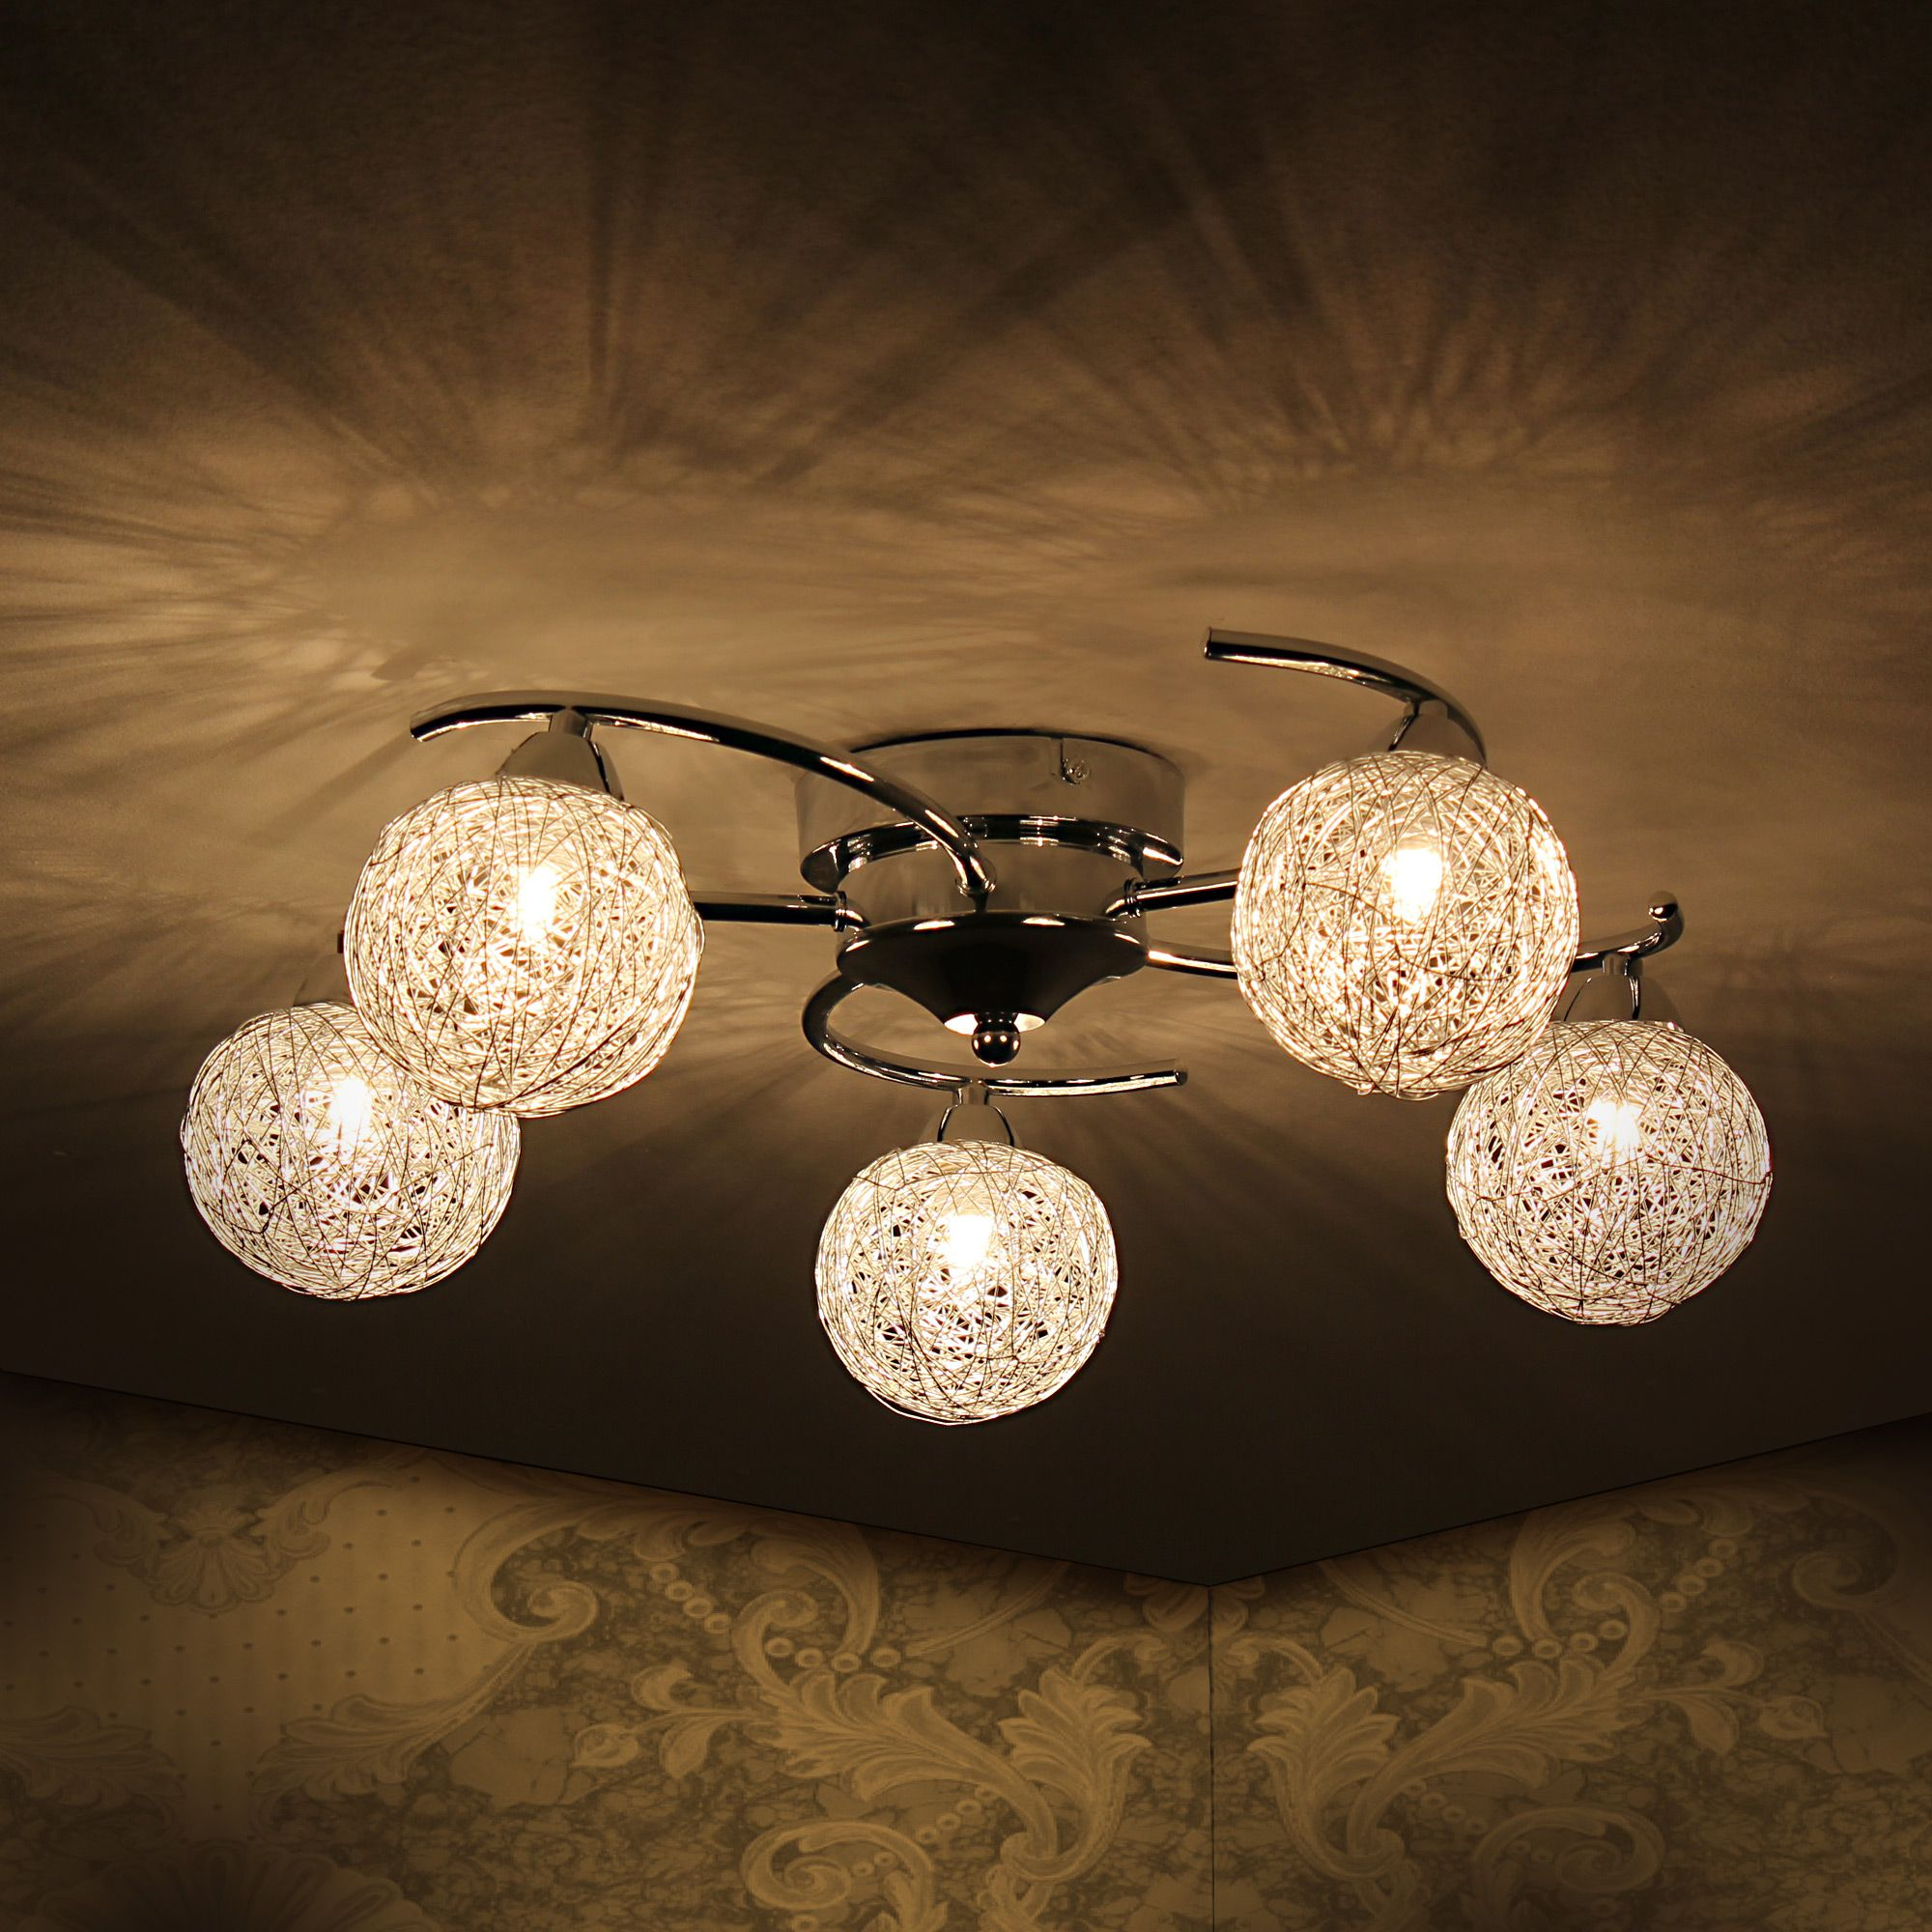 Lux Pro Ceiling Light Lamp